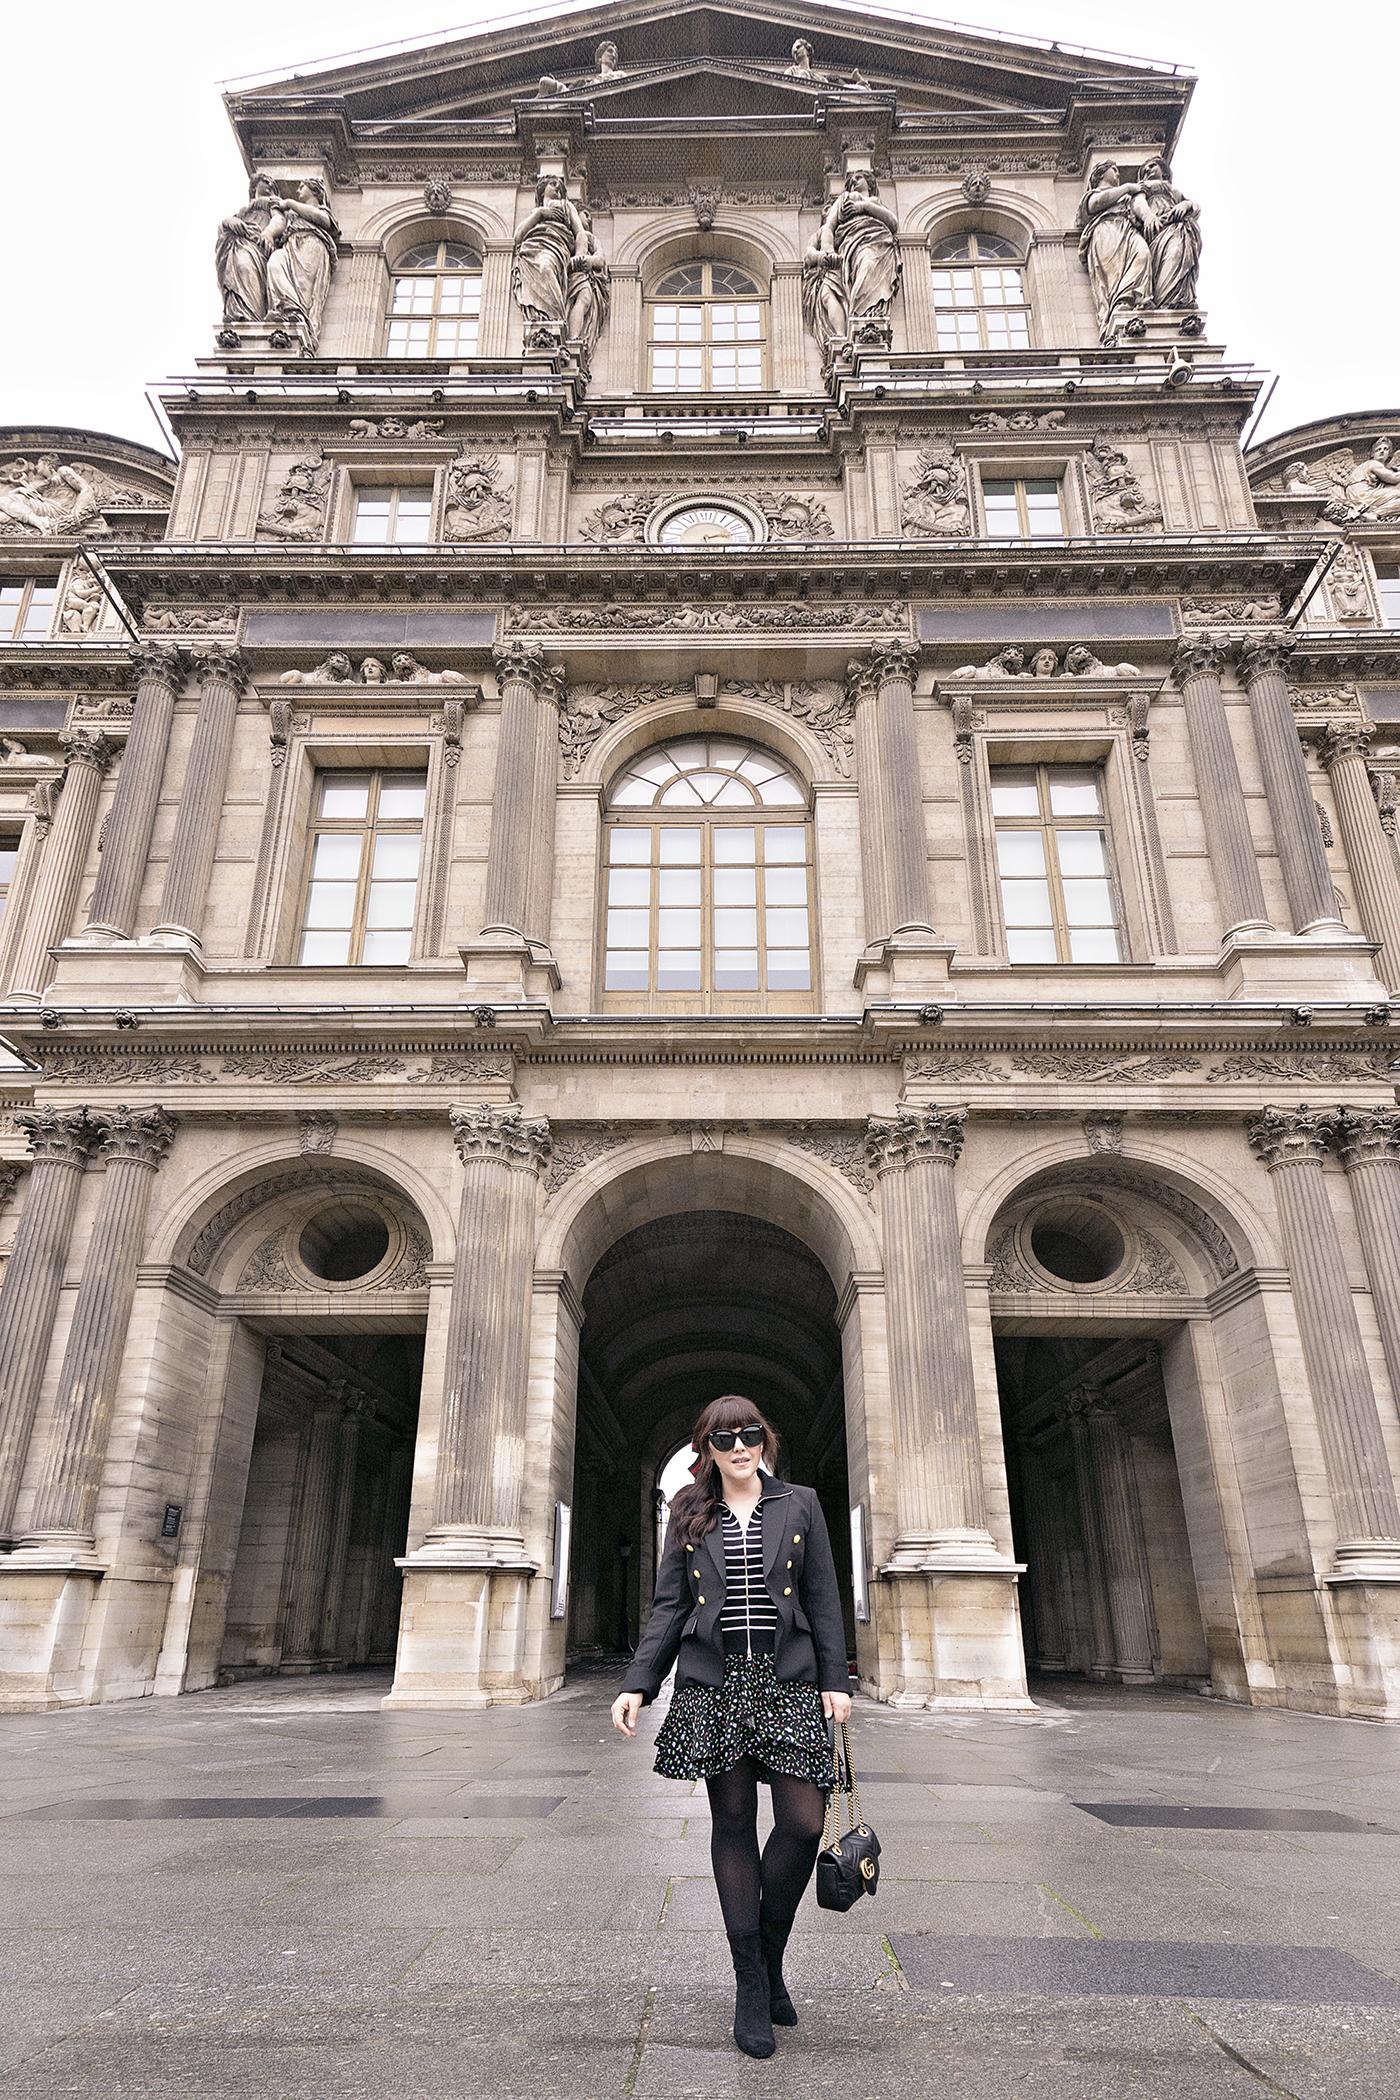 History in High Heels, Paris, Louvre